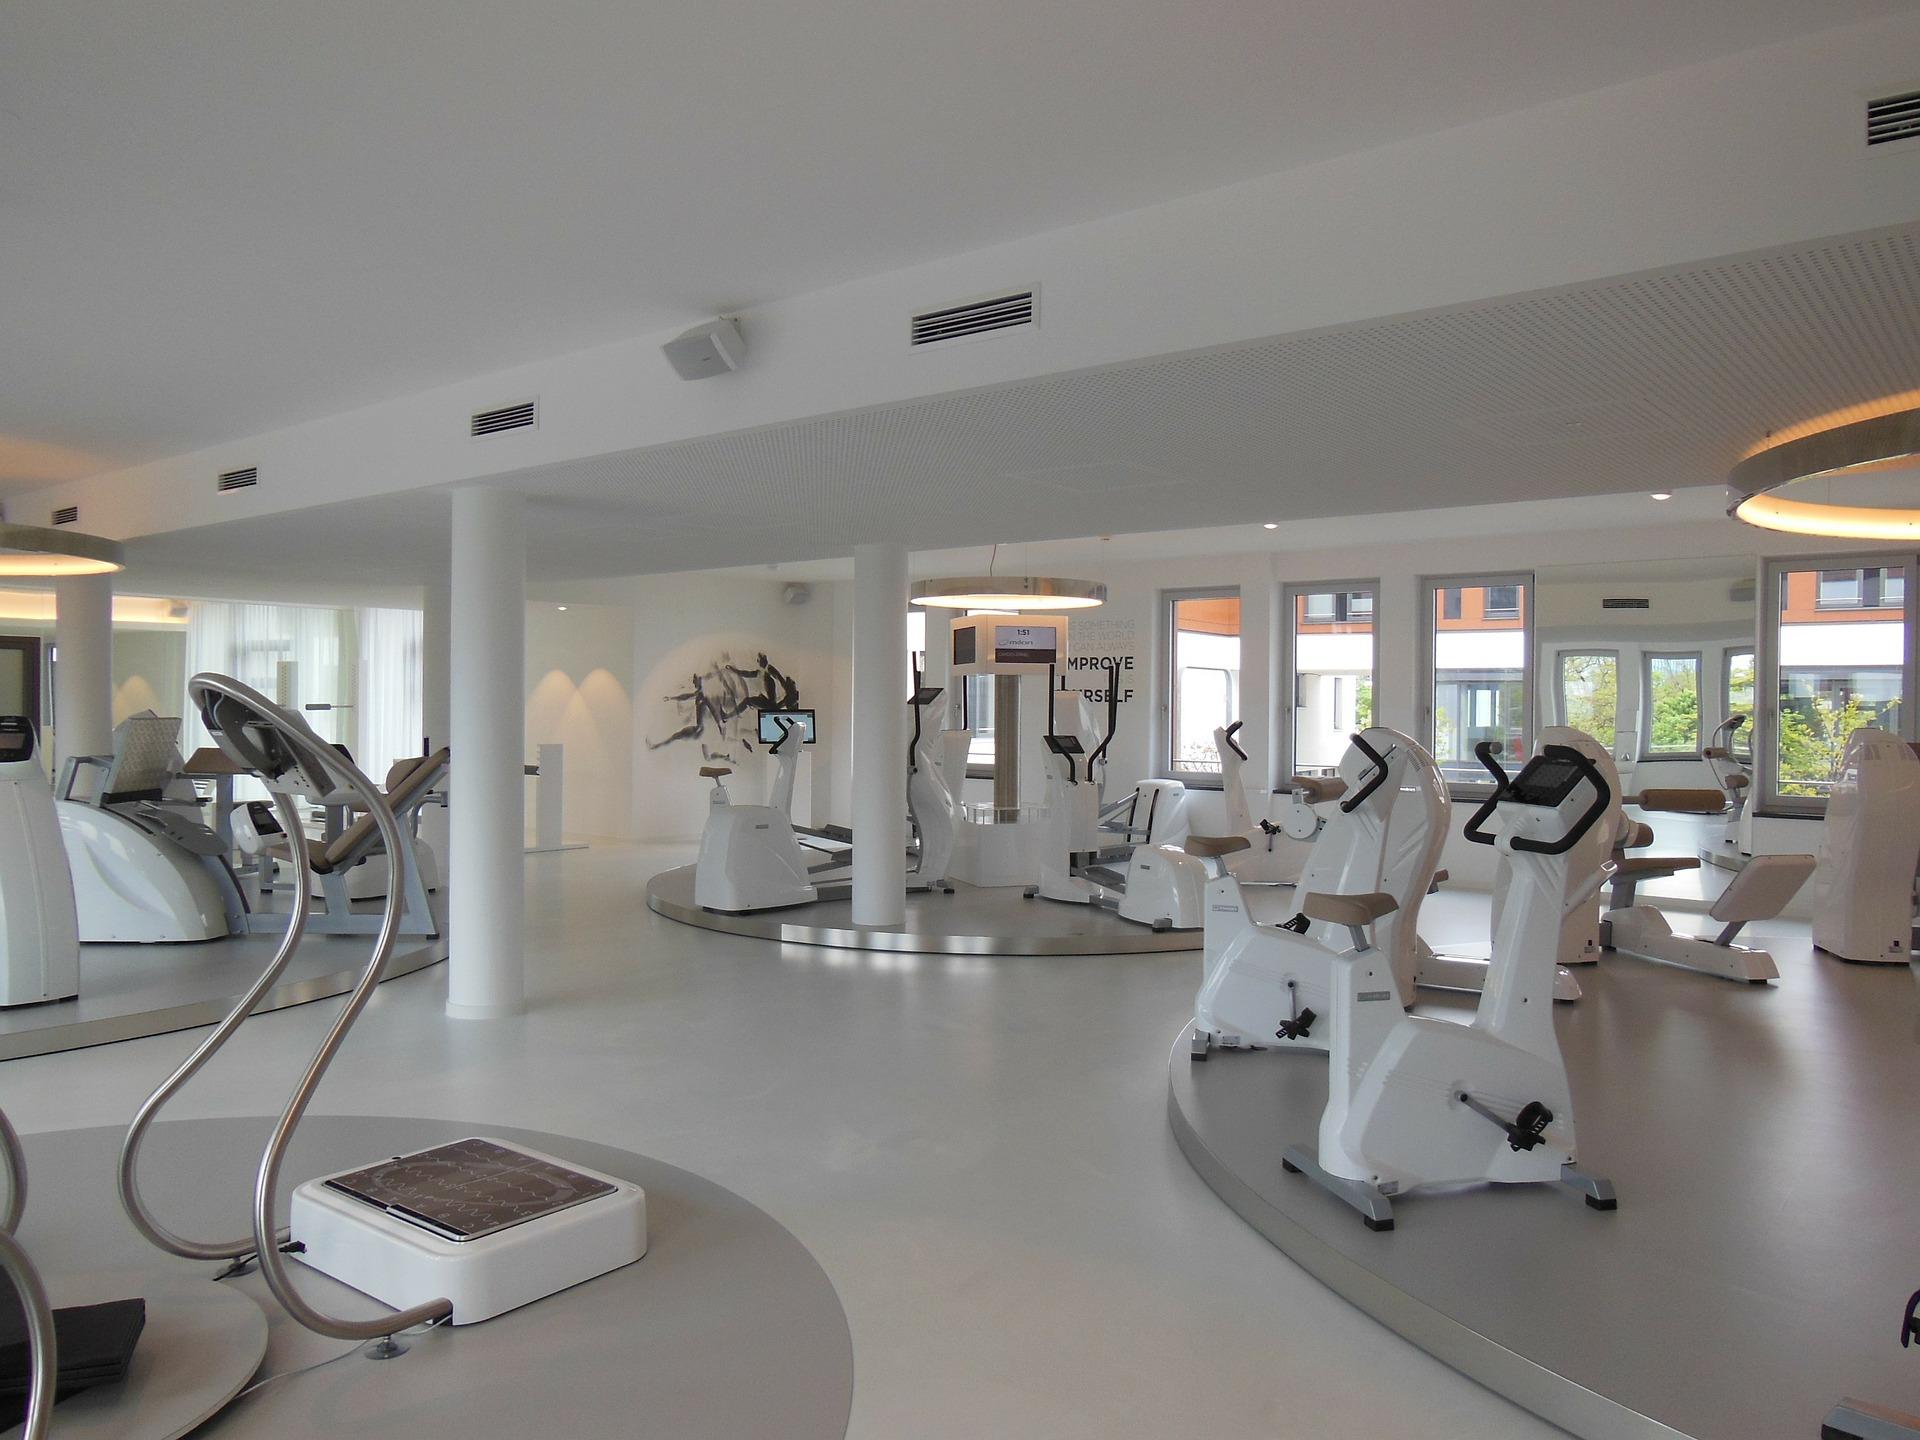 Rad Fitnessgerät